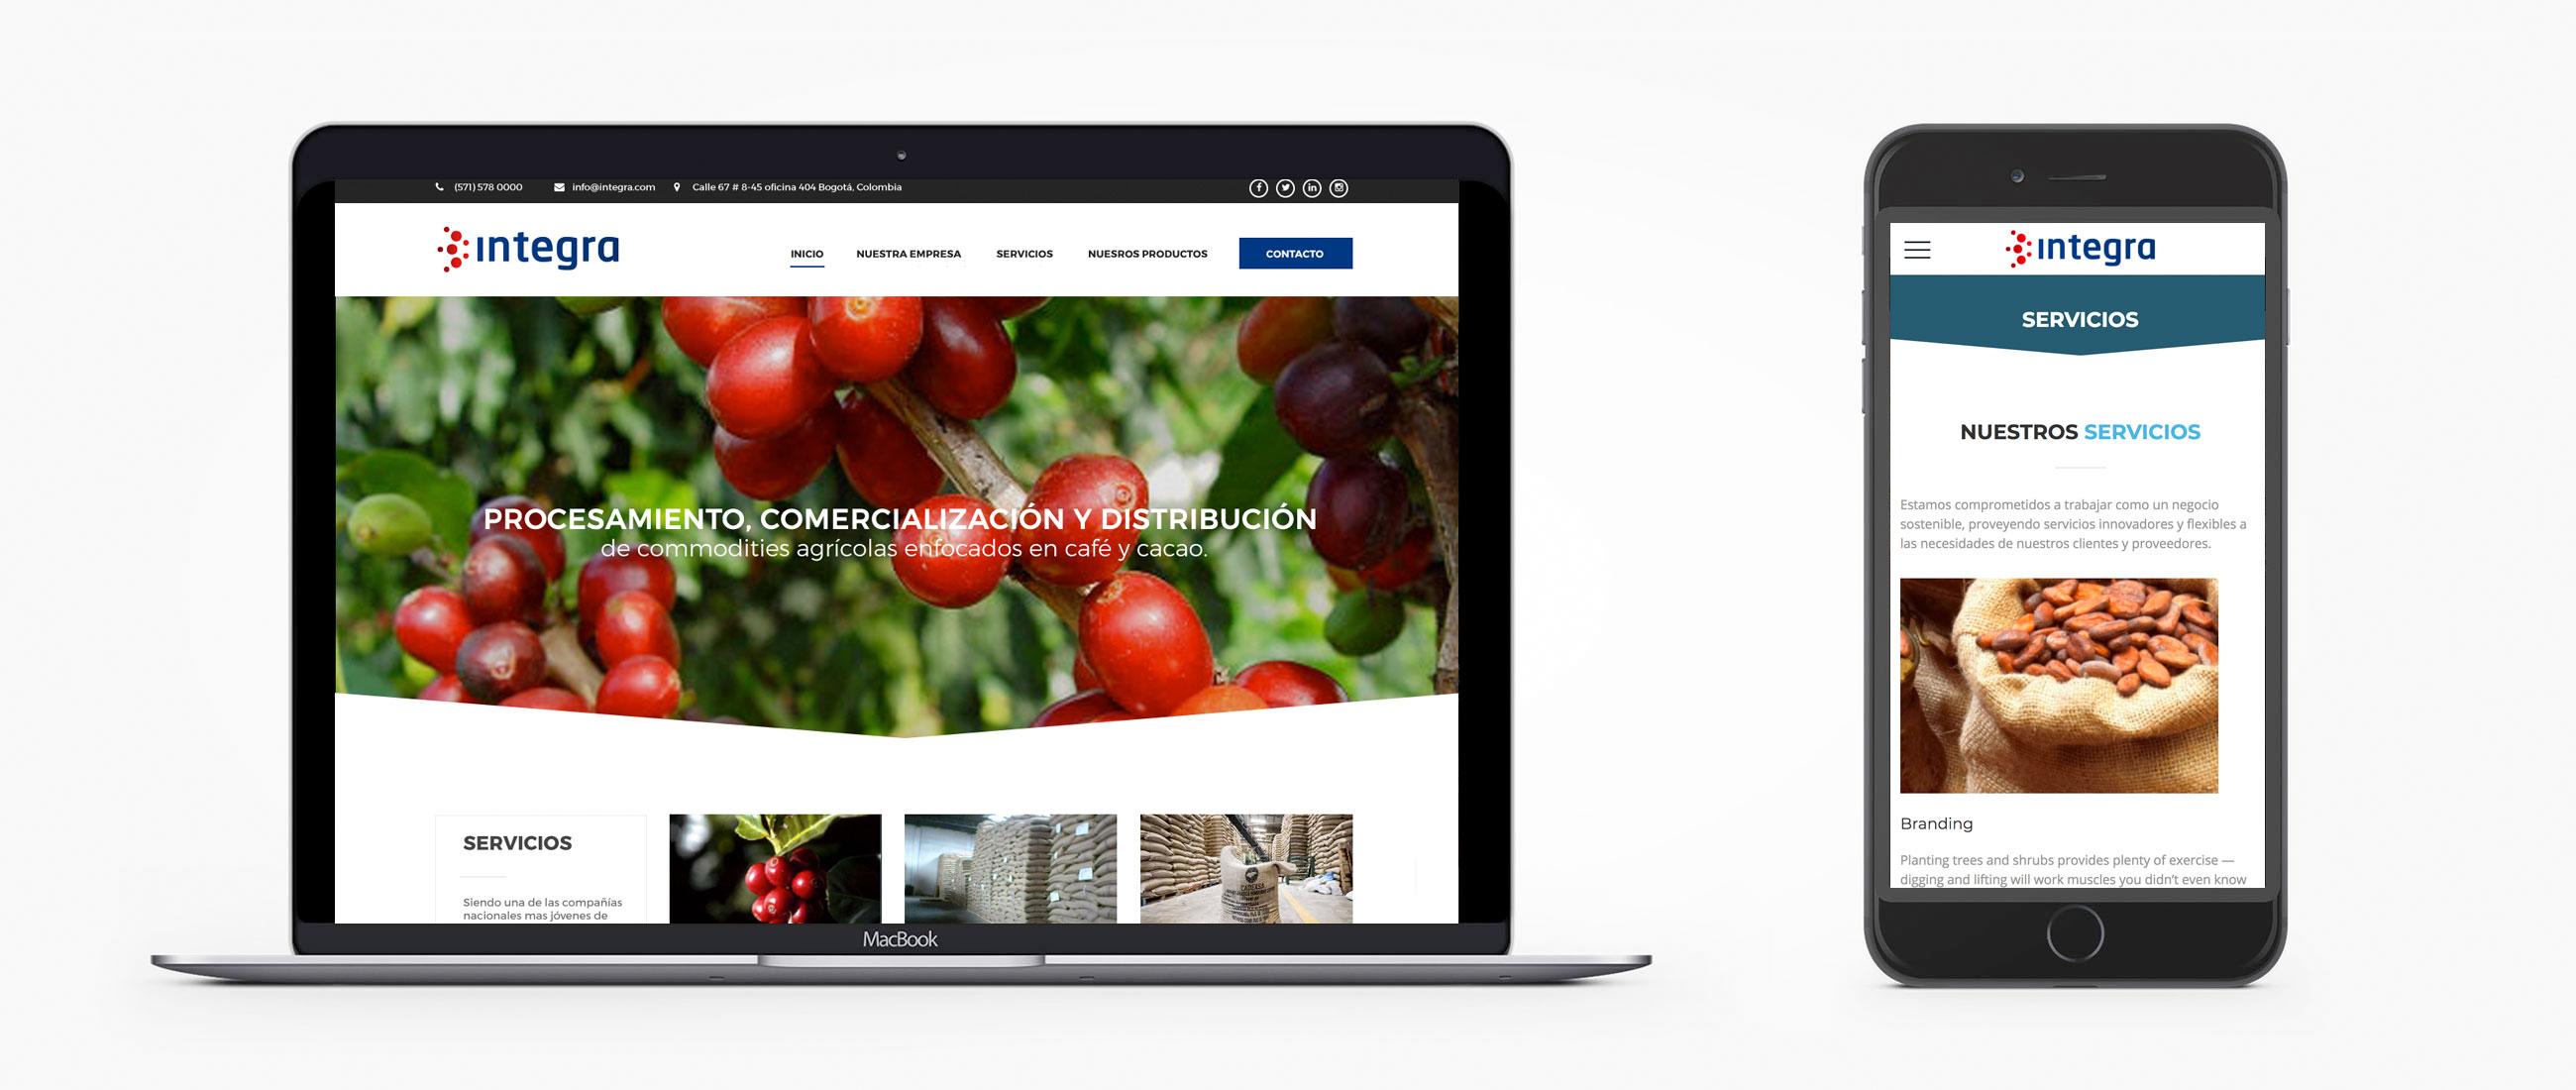 diseno-paginas-web-bogota-colombia_integra_2